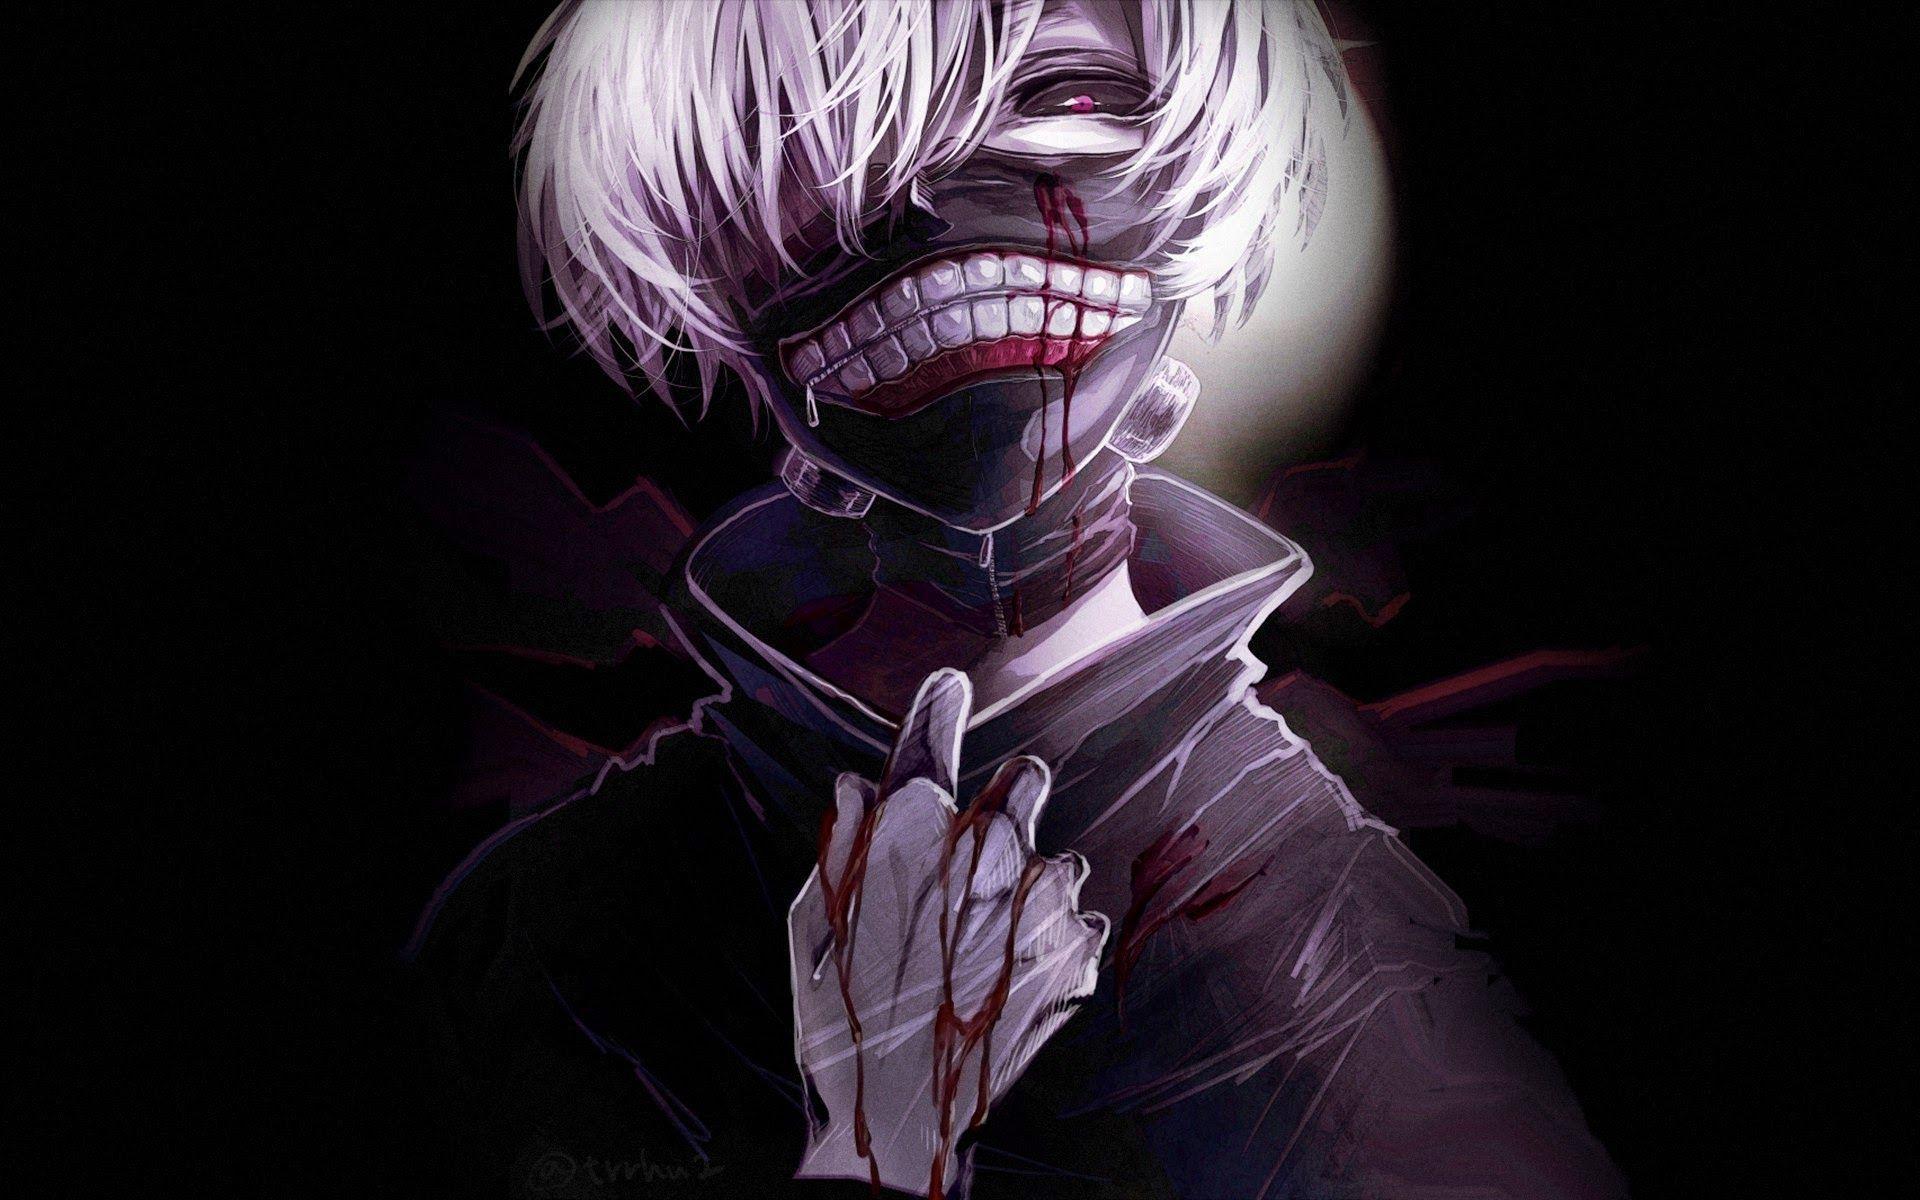 Killer Anime Wallpapers Top Free Killer Anime Backgrounds